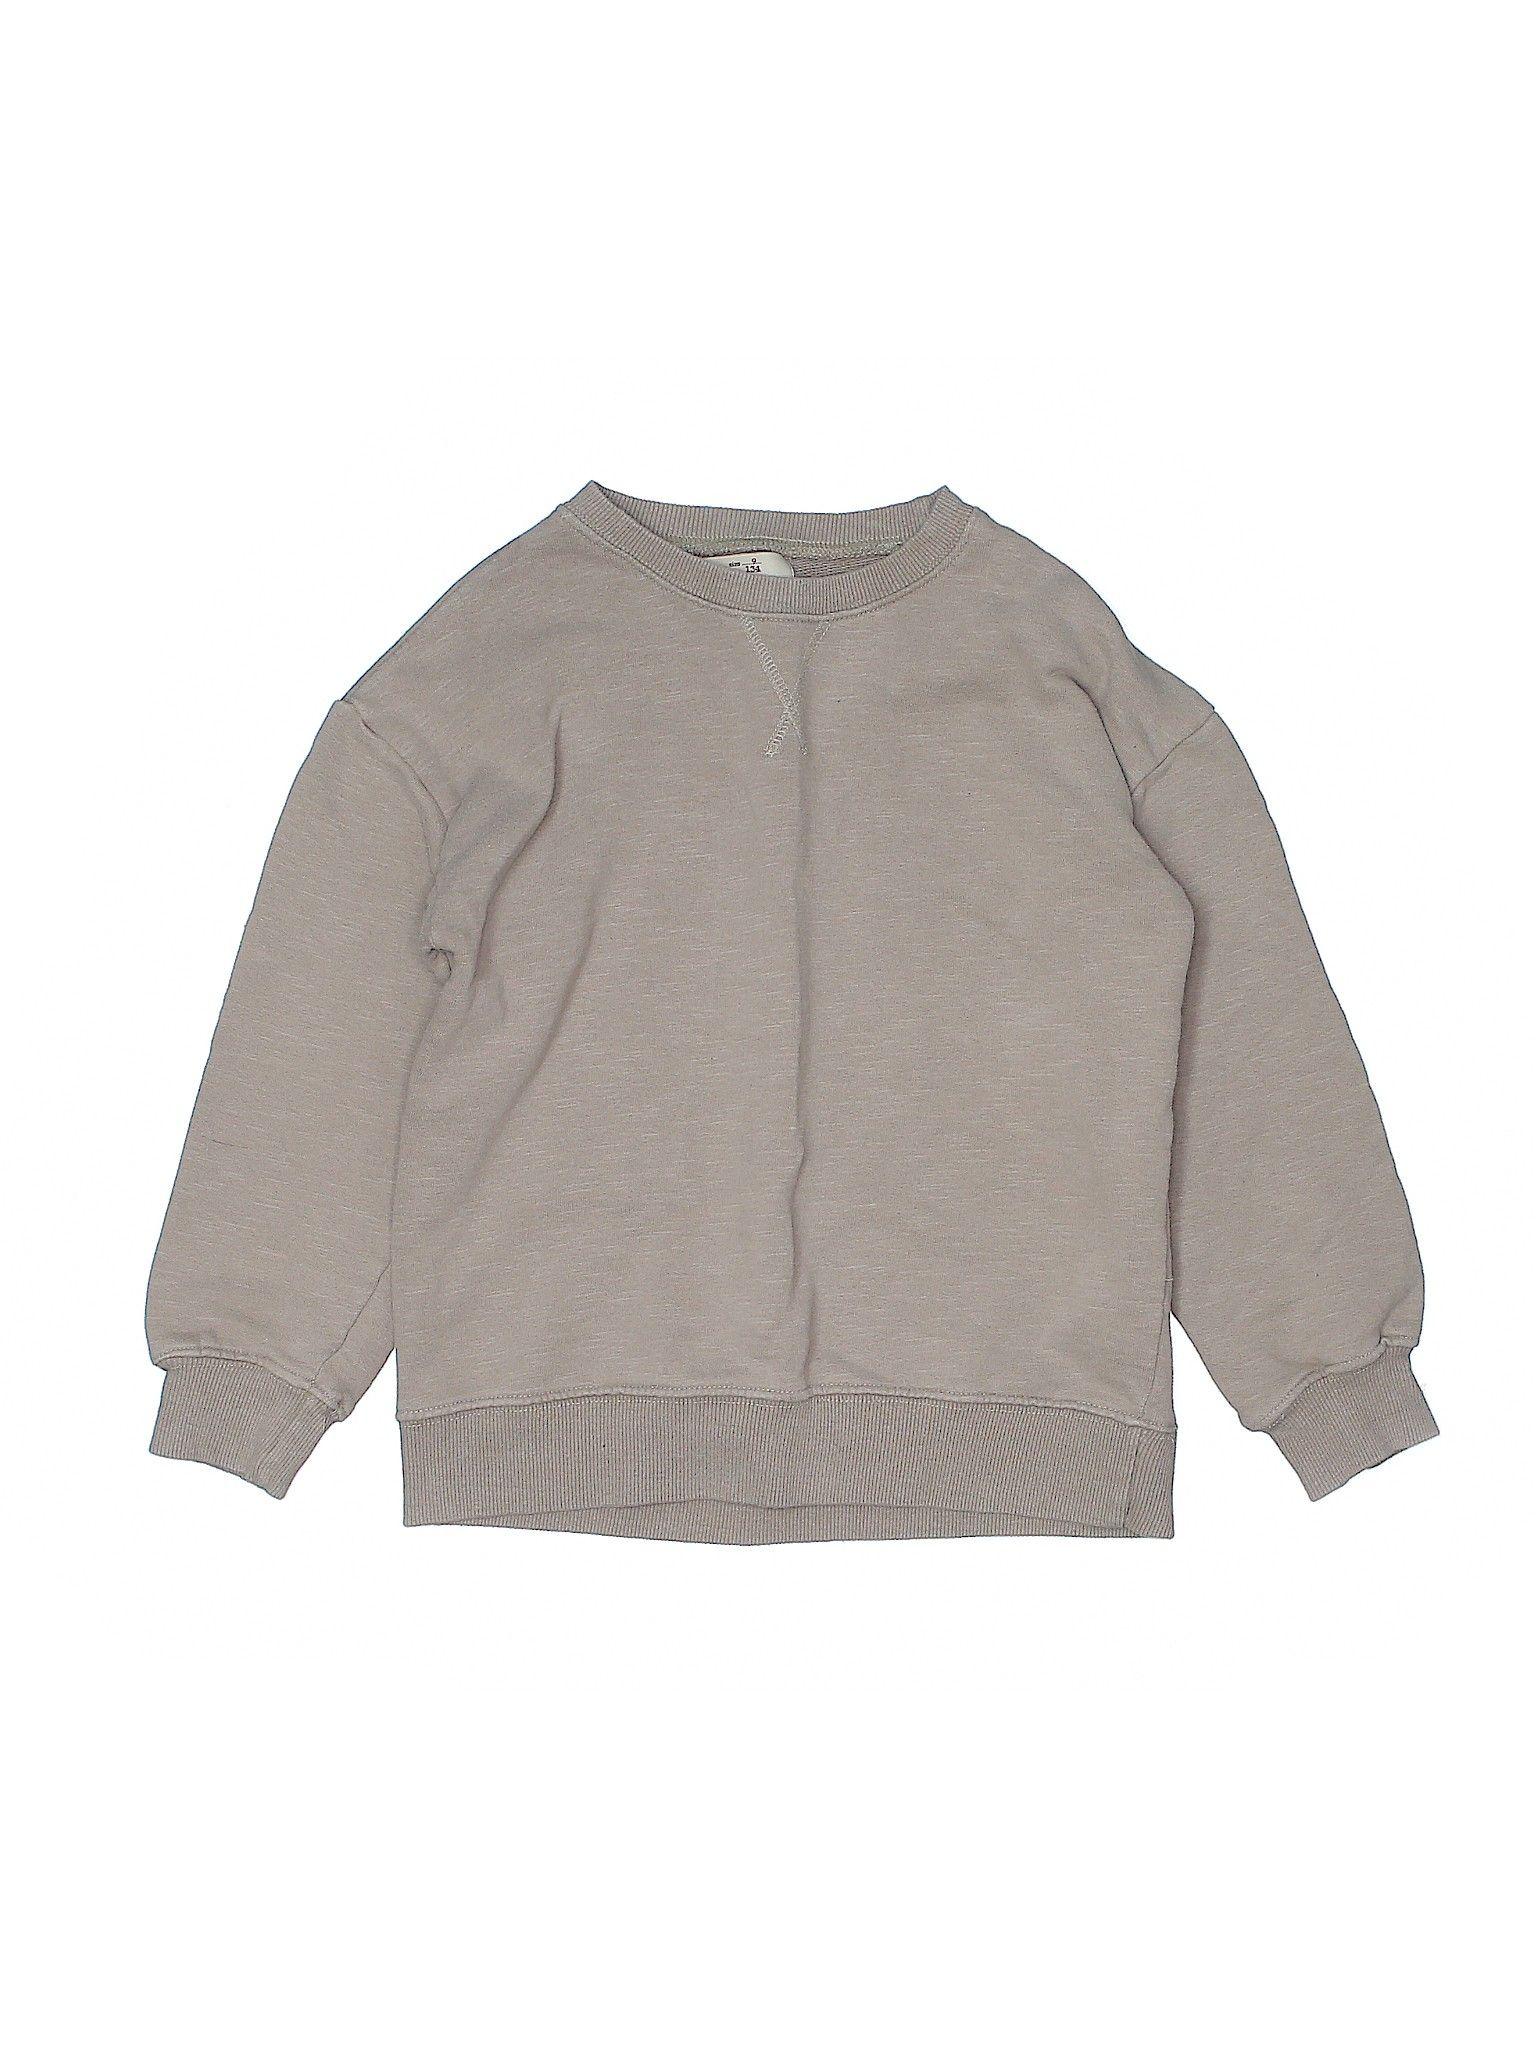 Zara Sweatshirt Tan Boy S Tops Size 9 Zara Sweatshirt Clothes Second Hand Clothes